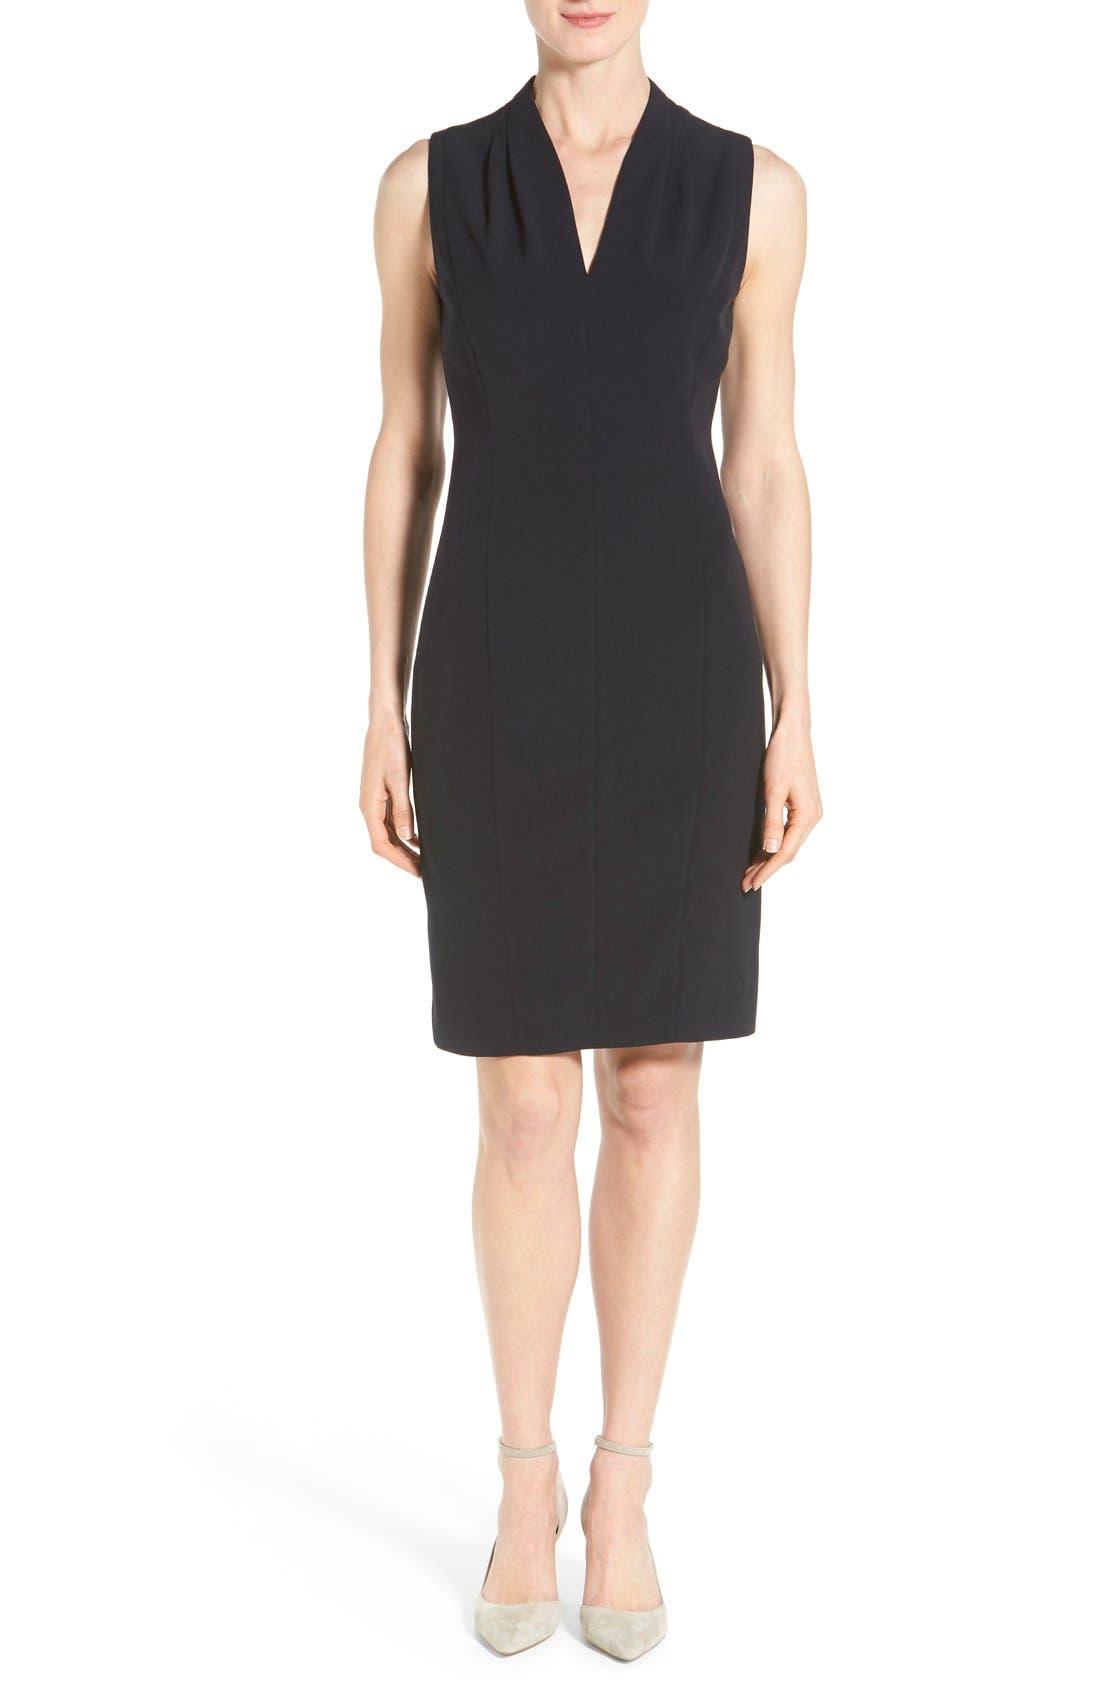 Alternate Image 1 Selected - T Tahari 'Tonya' V-Neck Sheath Dress